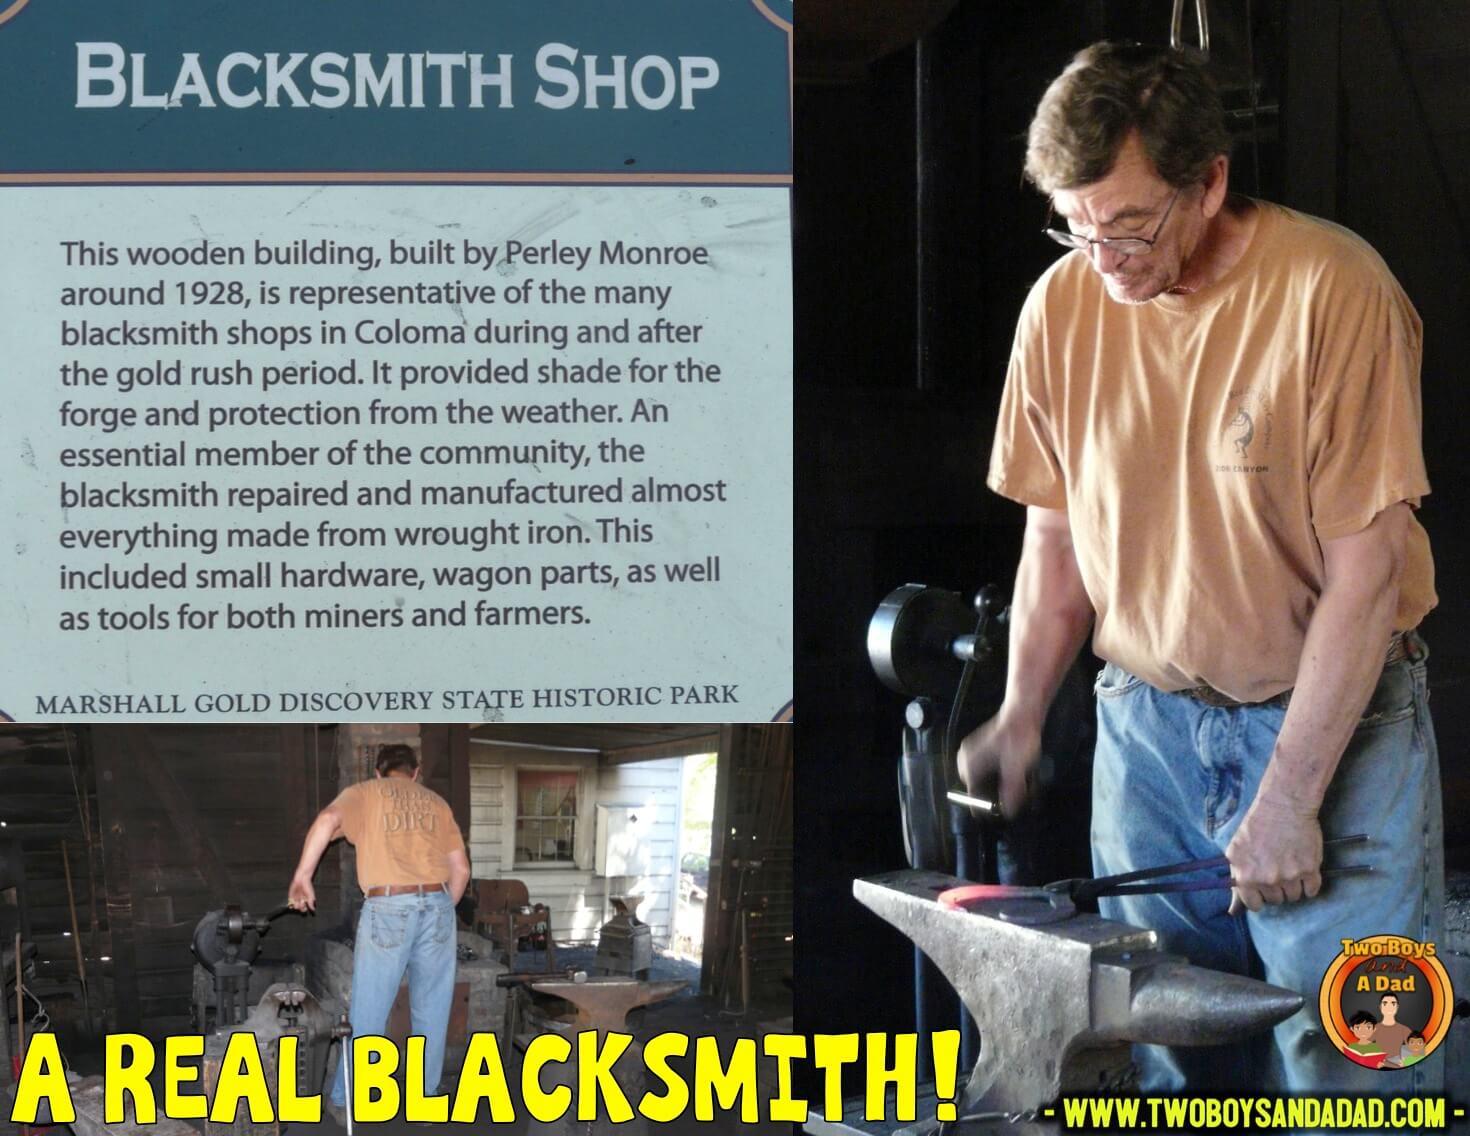 A blacksmith shows how to make a horseshoe